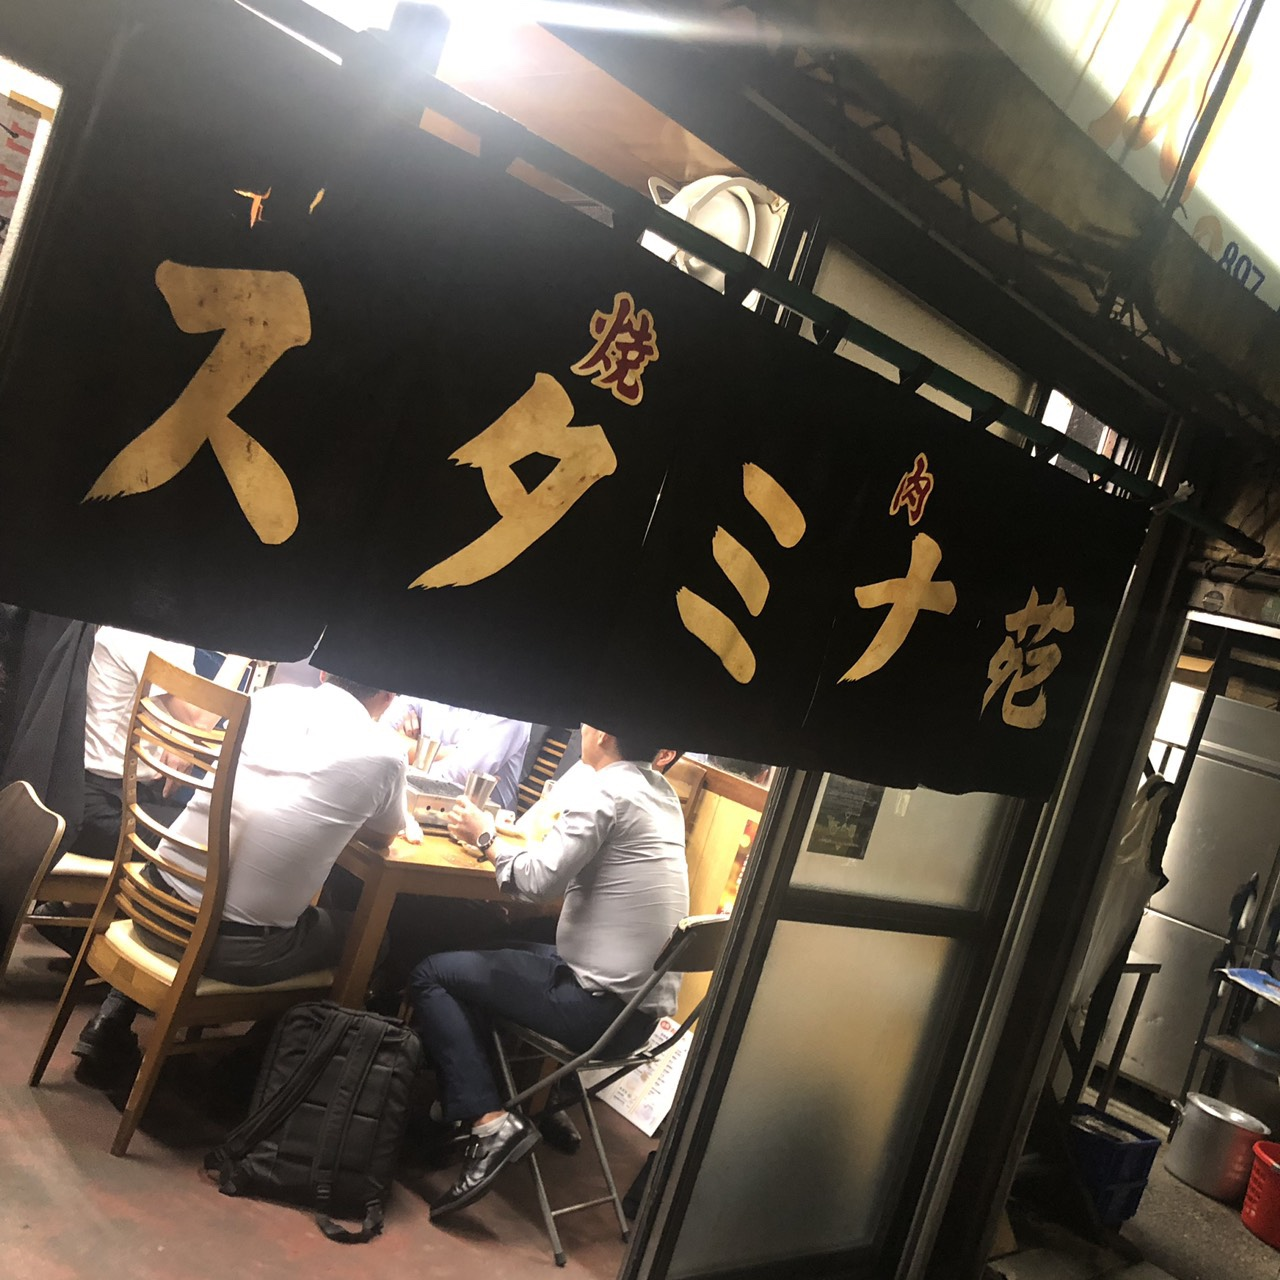 img 2937 - 行列のできる焼肉店「スタミナ苑」へ